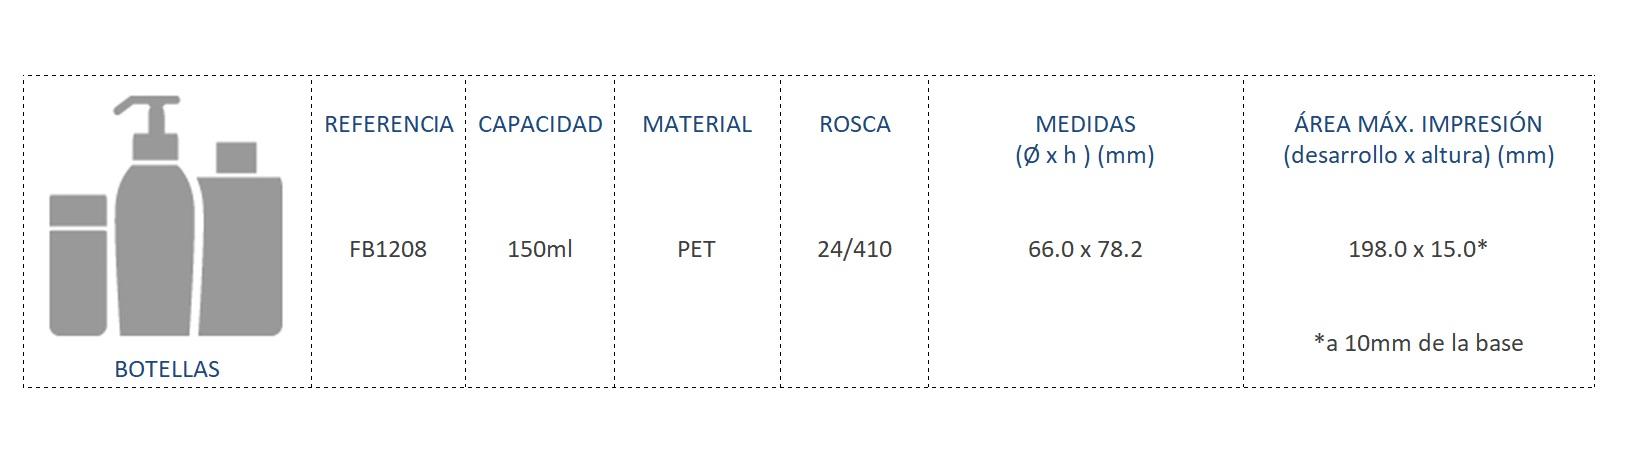 Cuadro de materiales botella FB1208